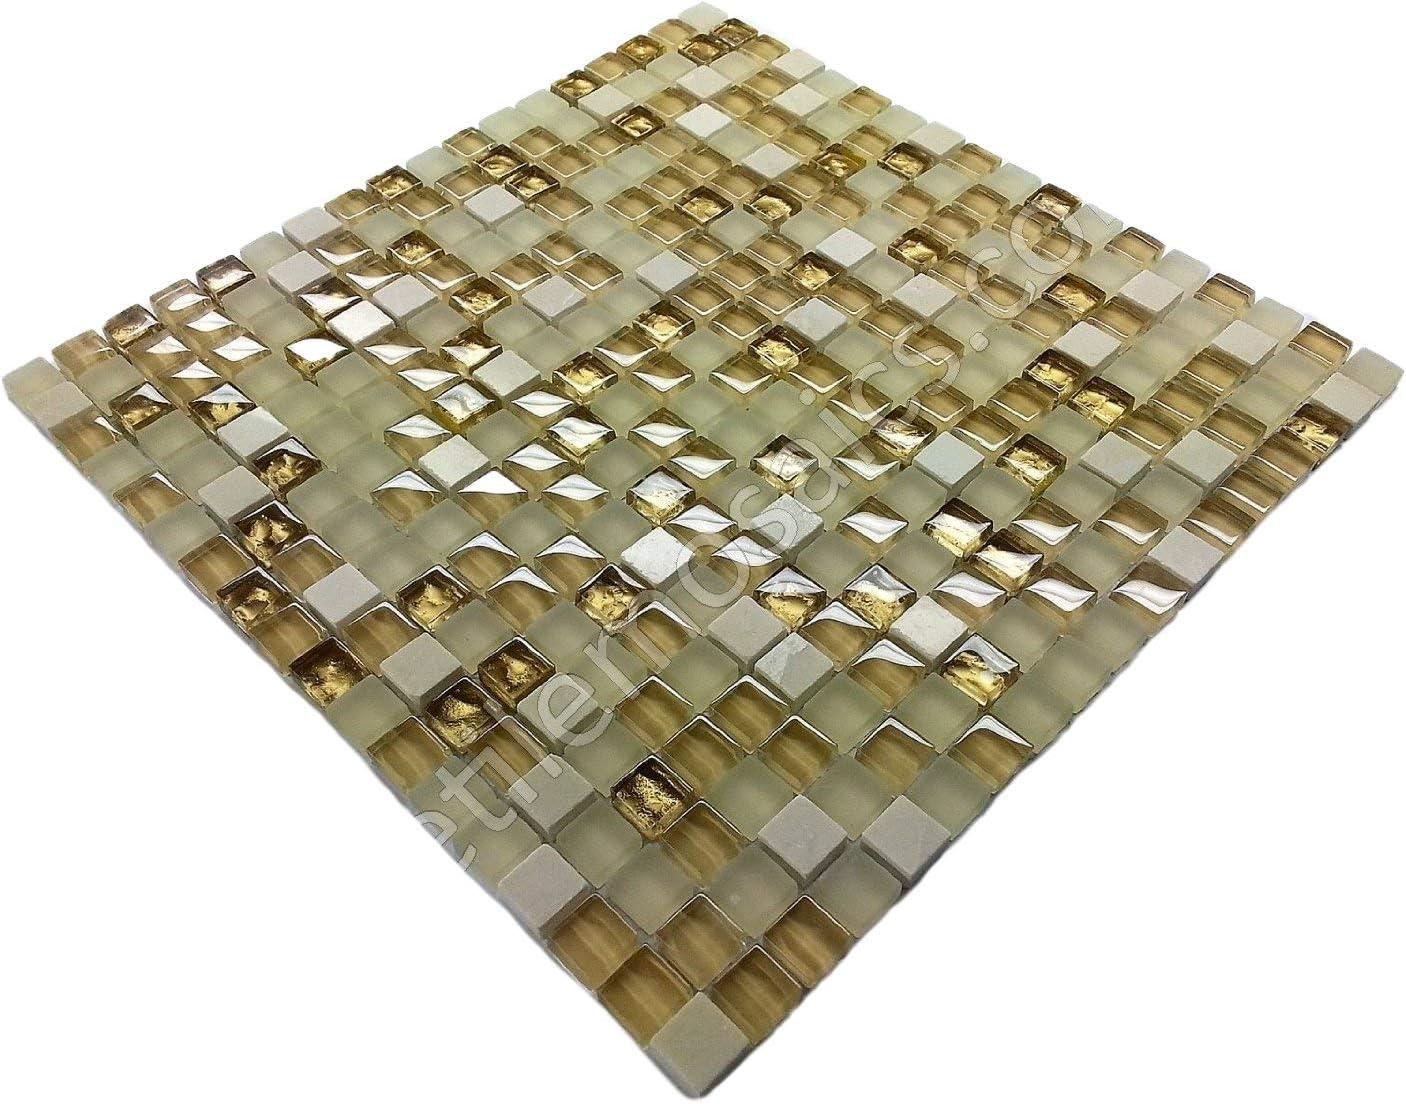 - Vogue Premium Quality Botticino Marble Gold Glass Mixed Square